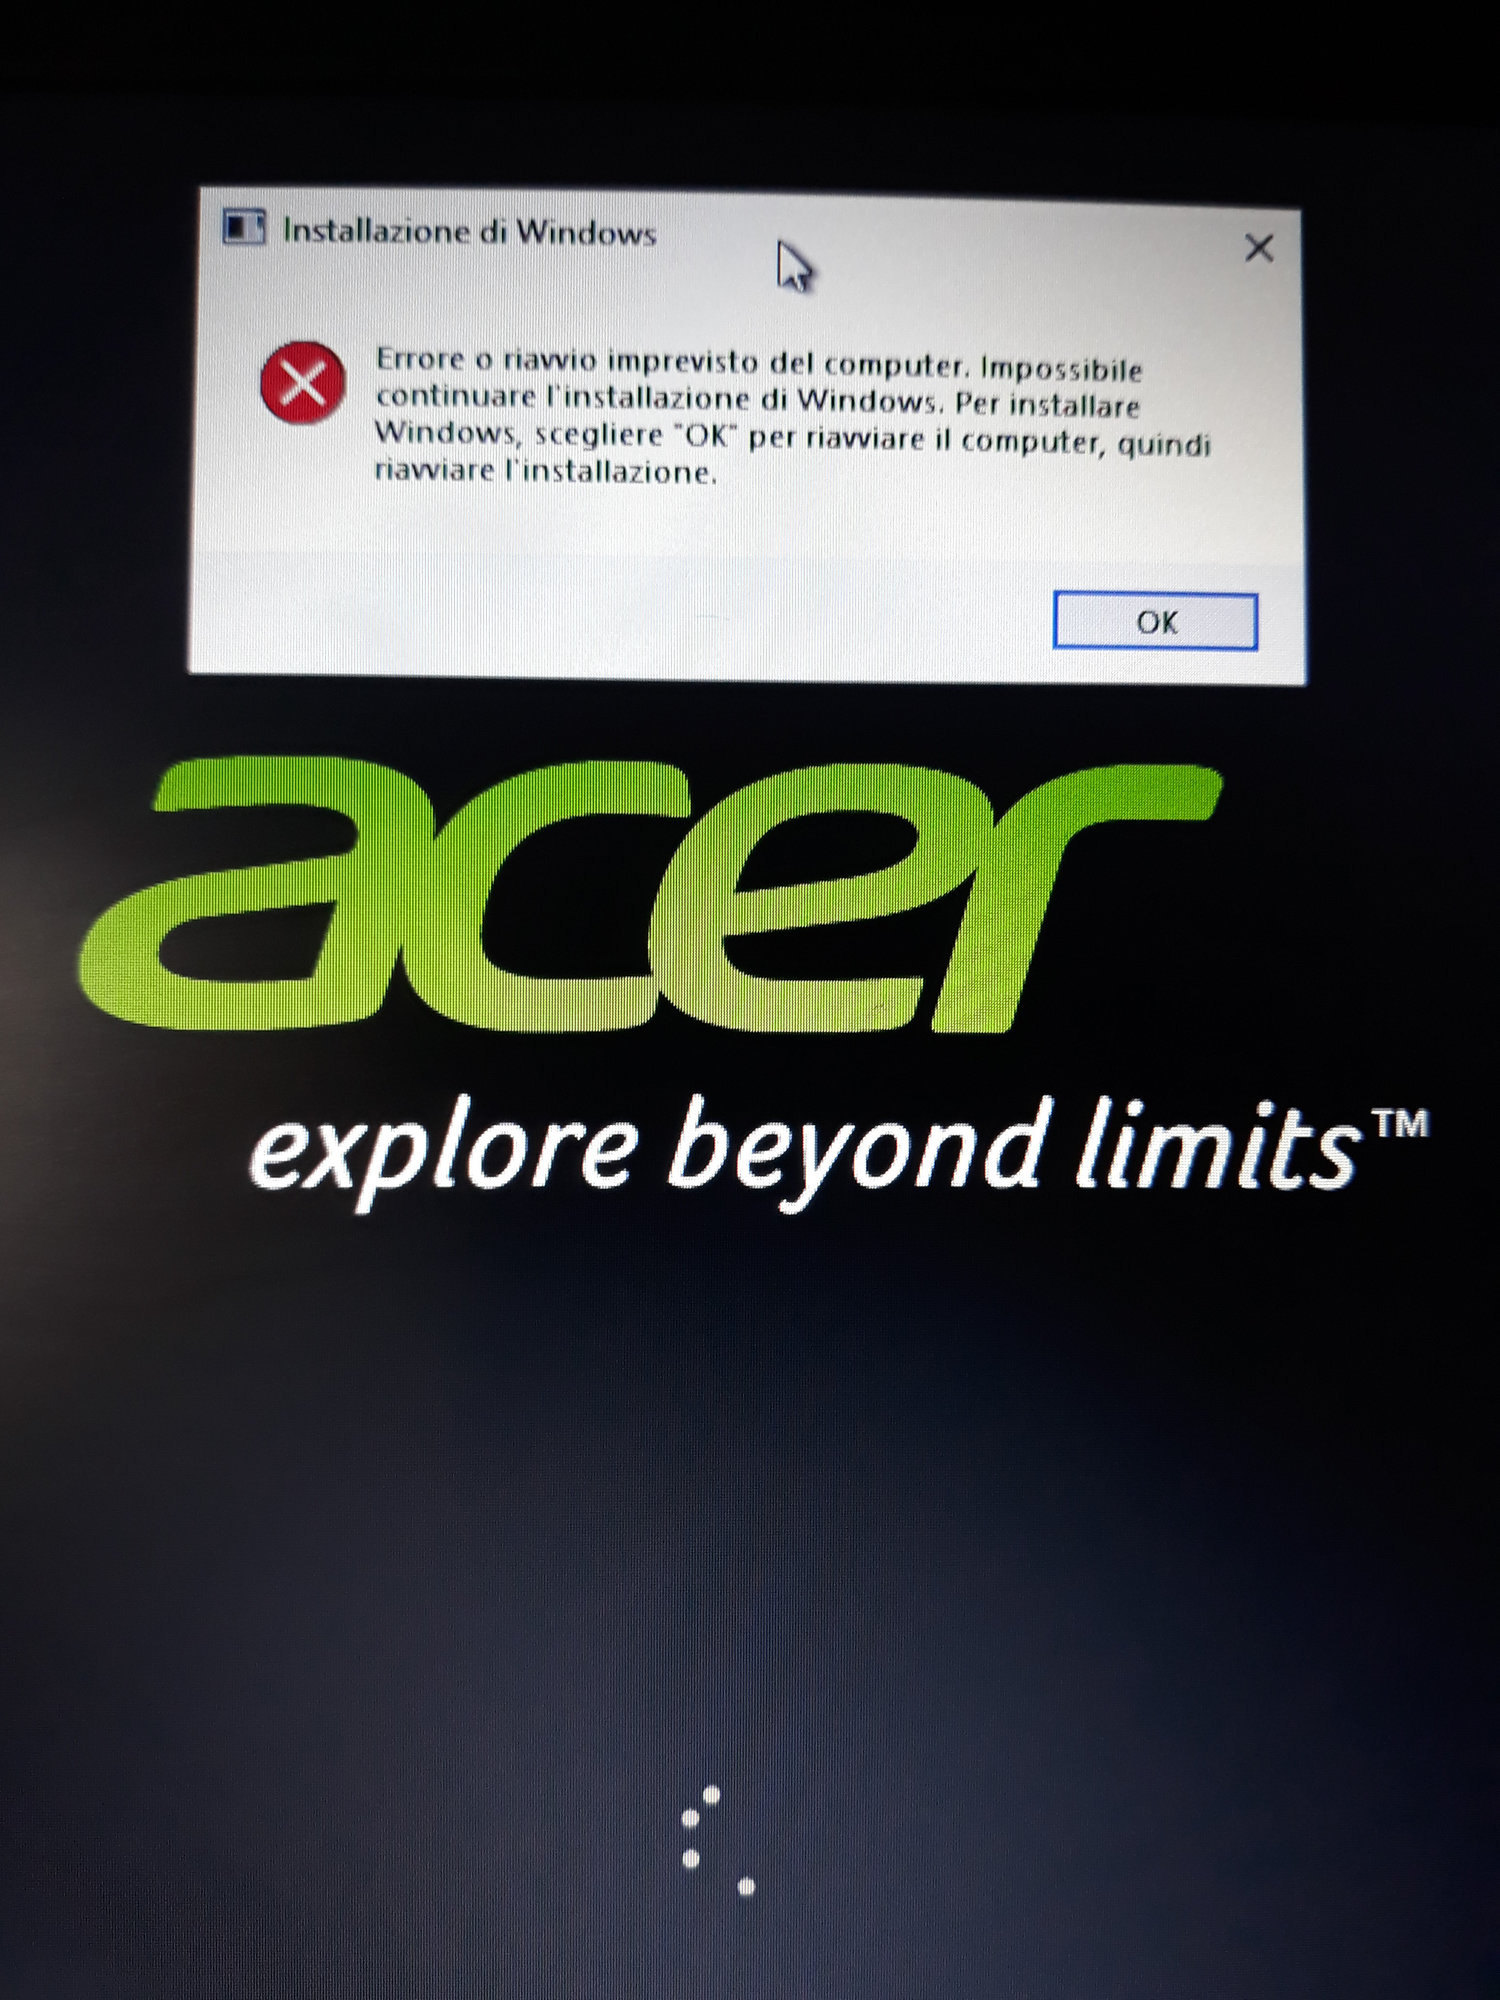 How to Reinstall Windows 10 Cloudbook 14 AO1-431 from USB key — Acer  Community